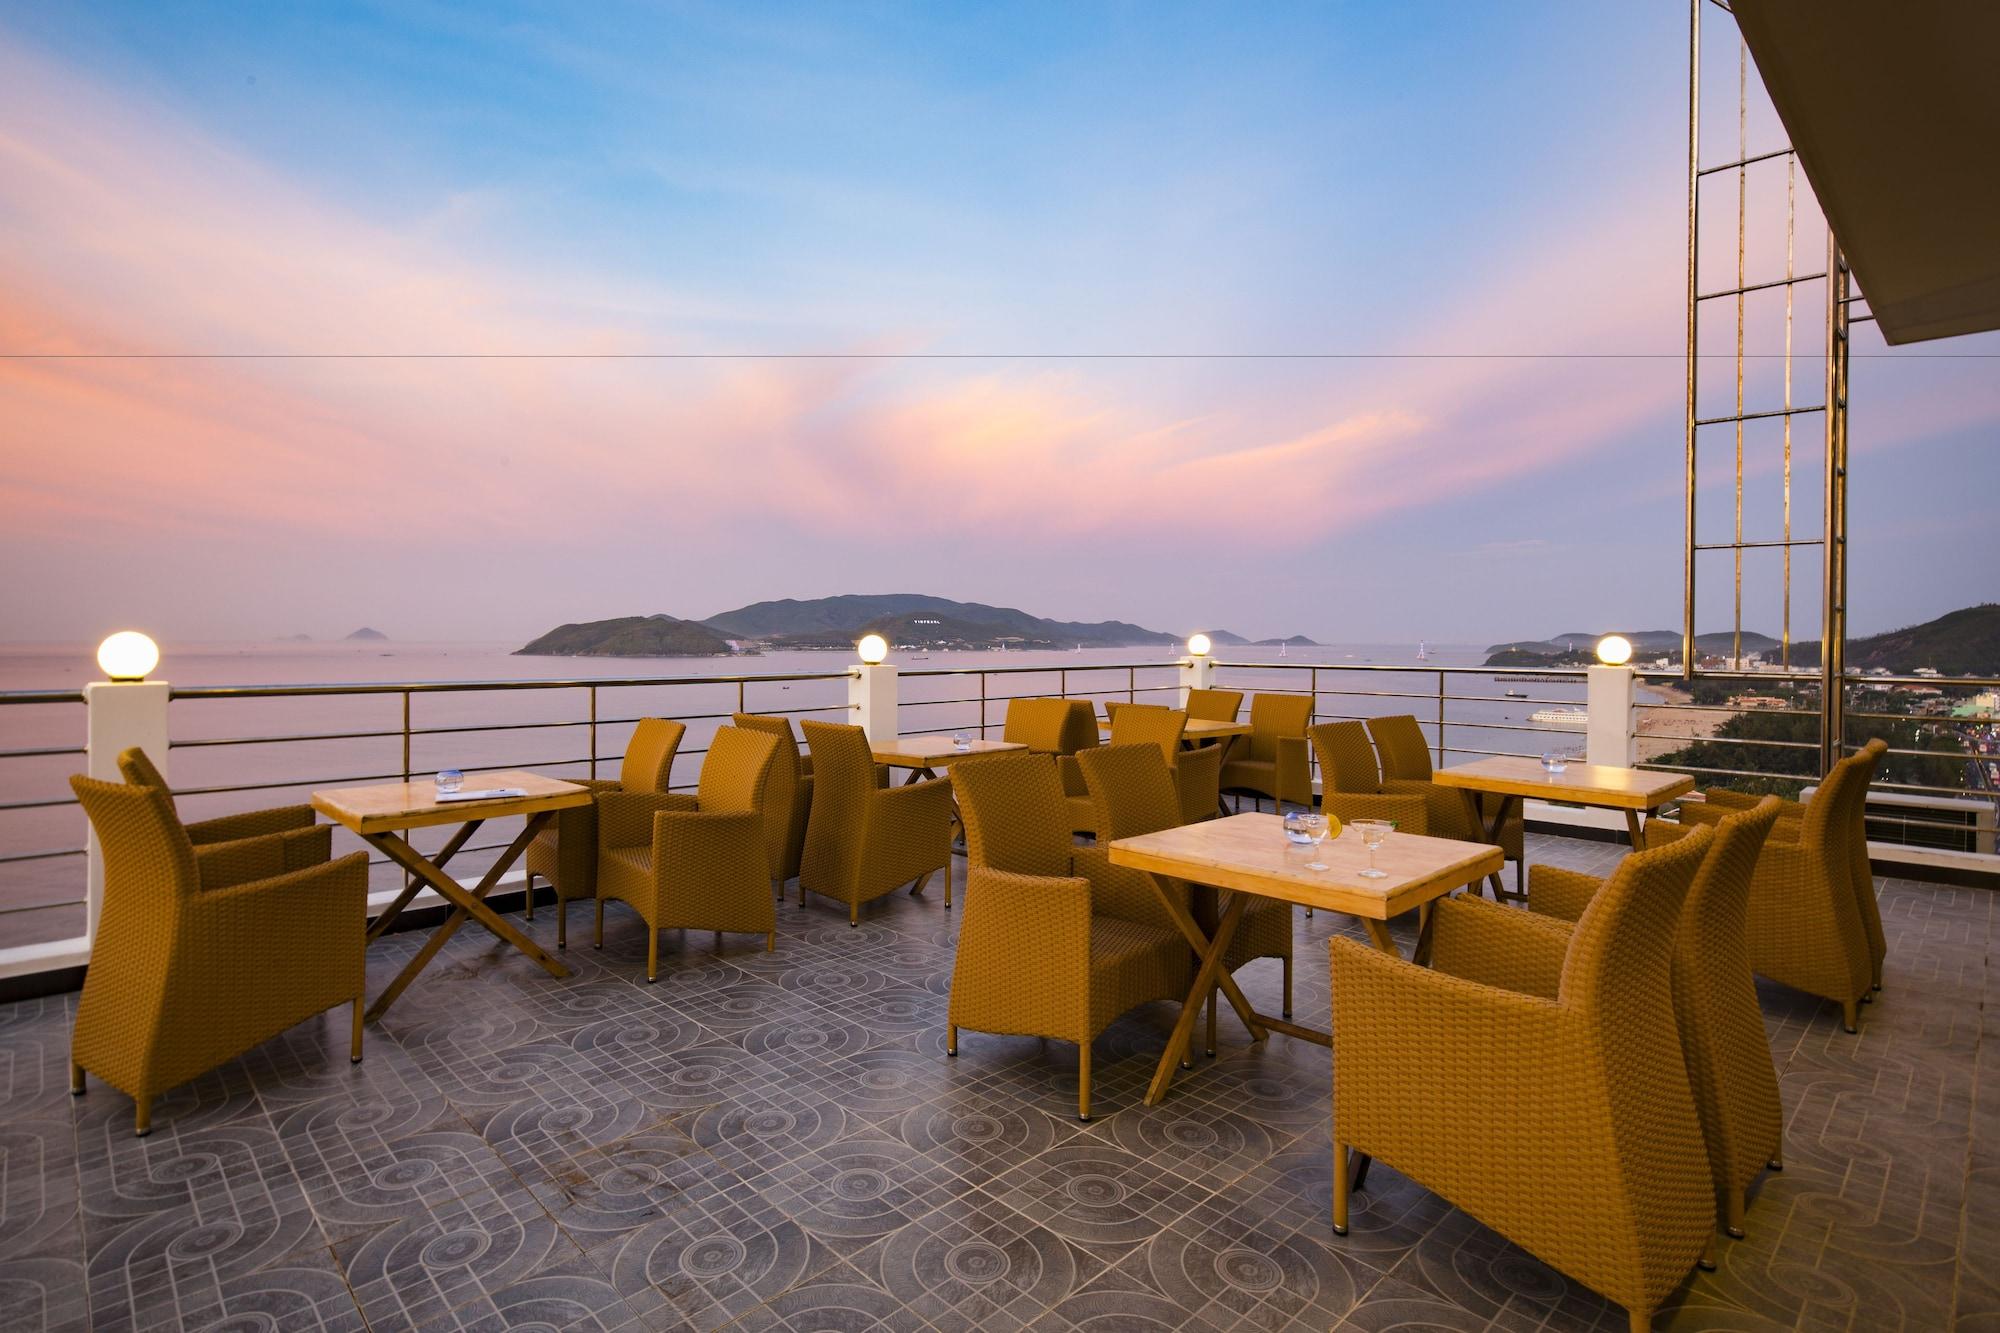 Majestic Star Hotel, Nha Trang